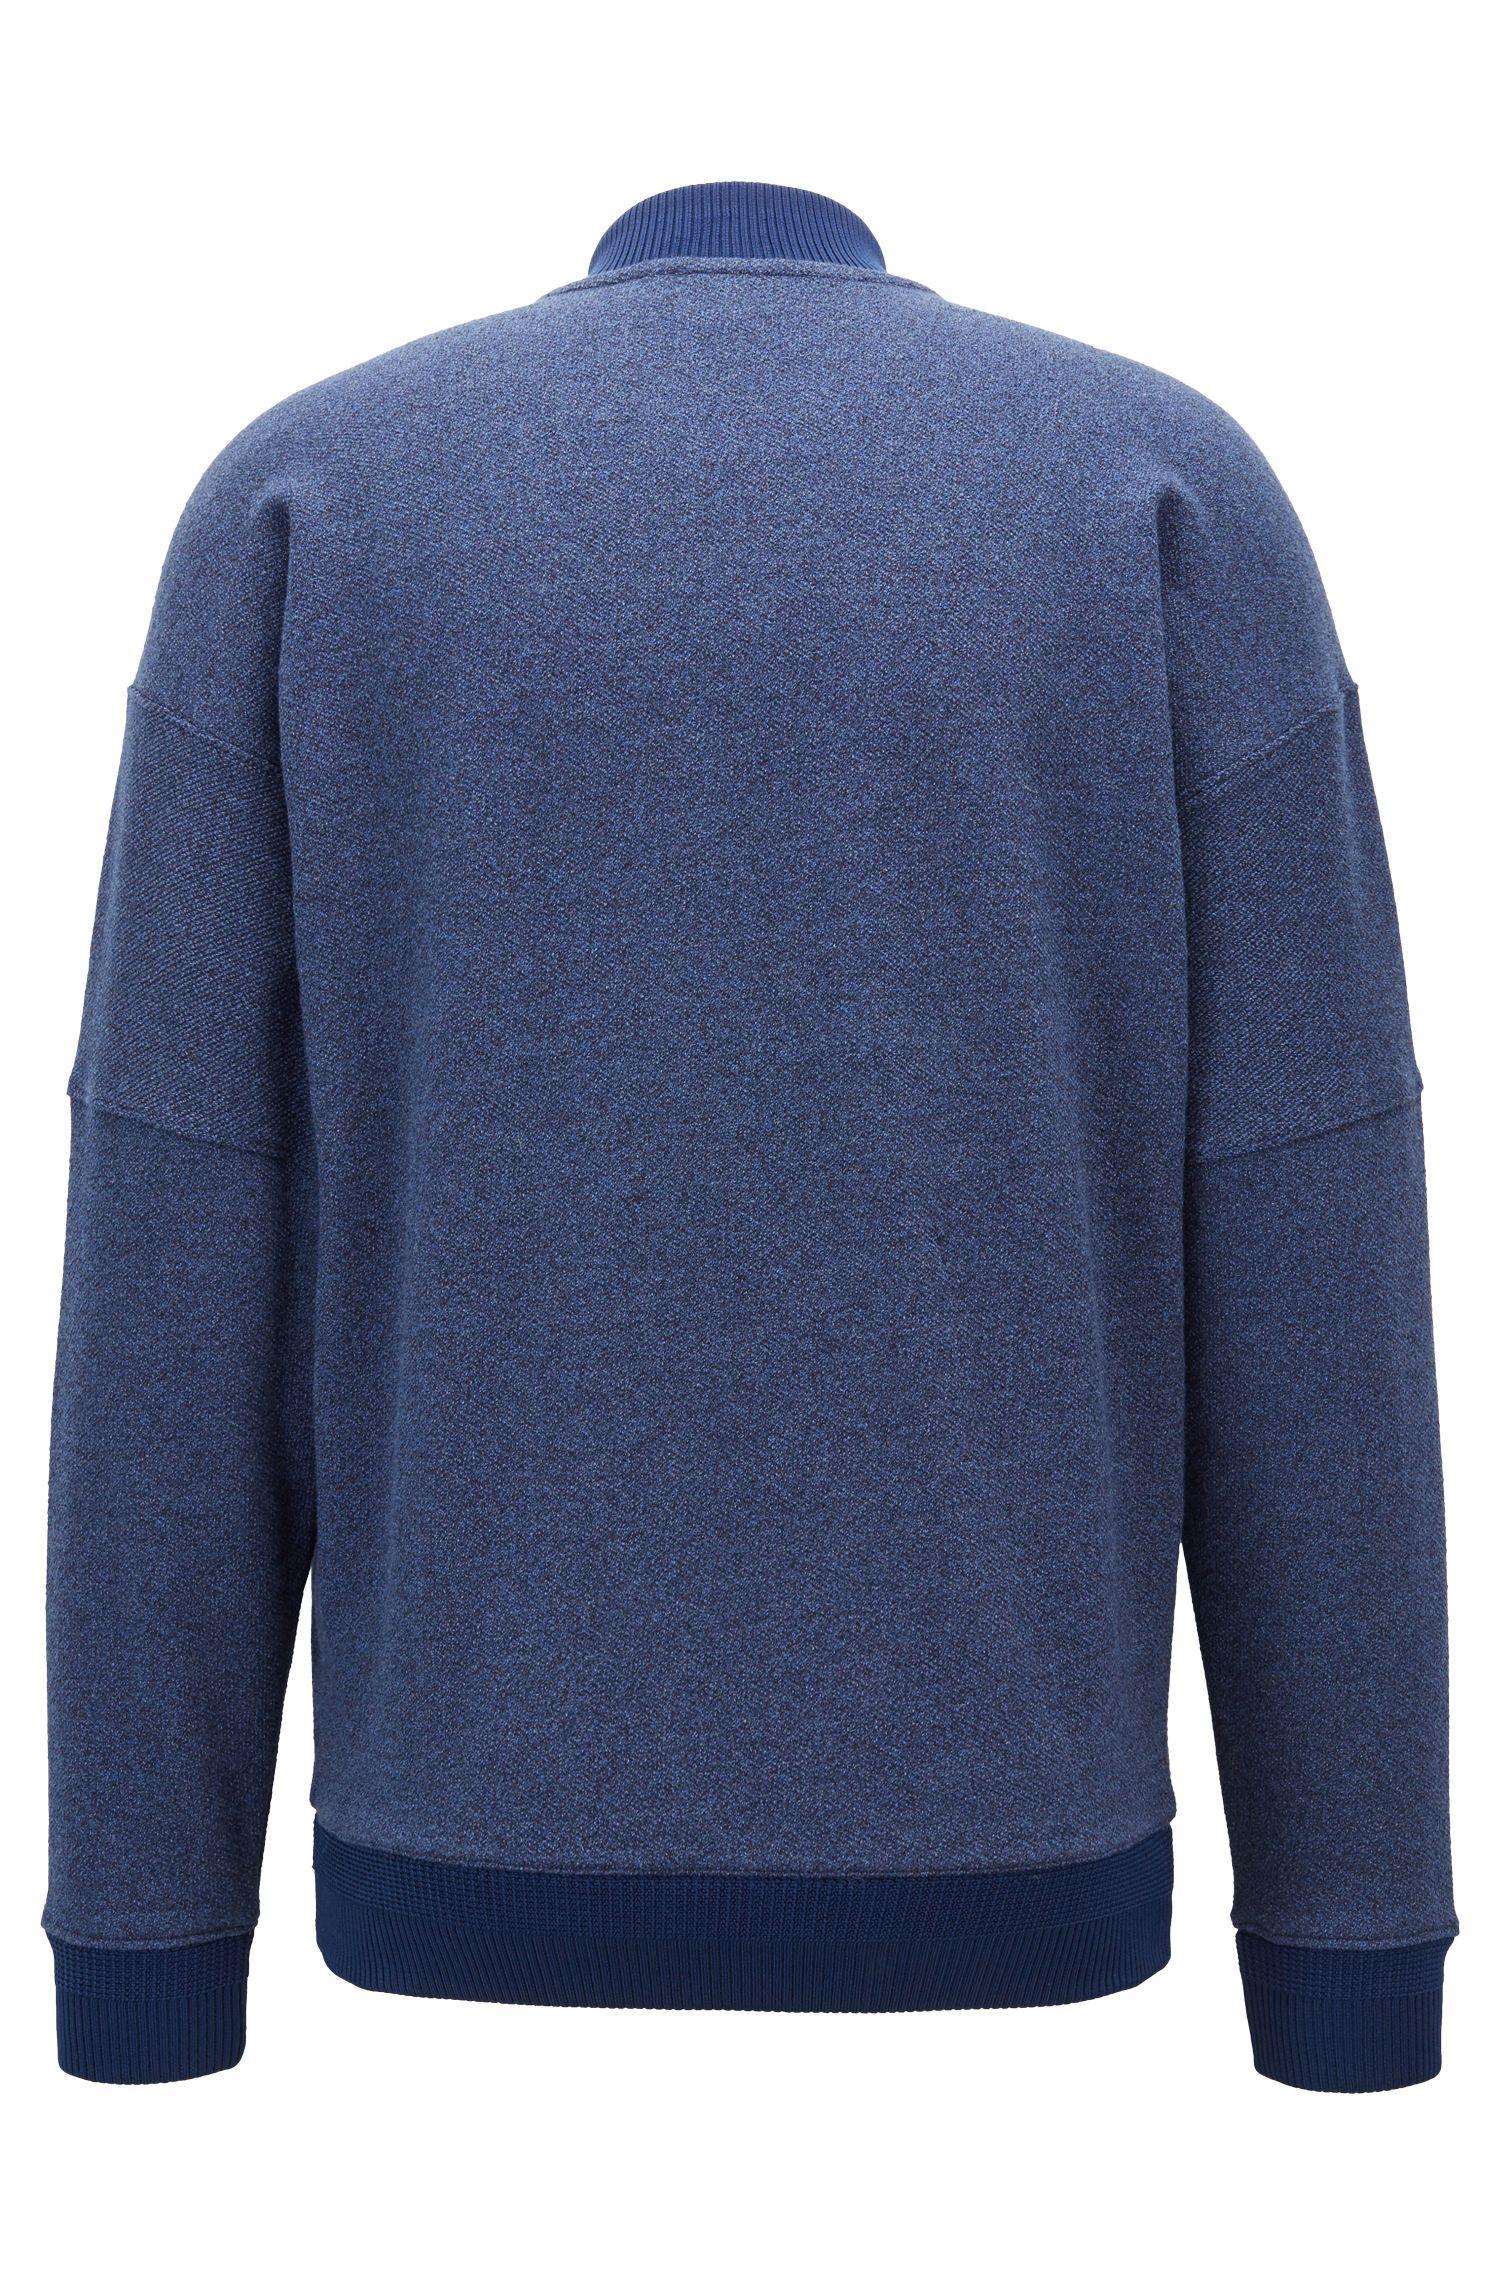 Zippered sweatshirt in heathered denim-effect terry cotton, Open Blue